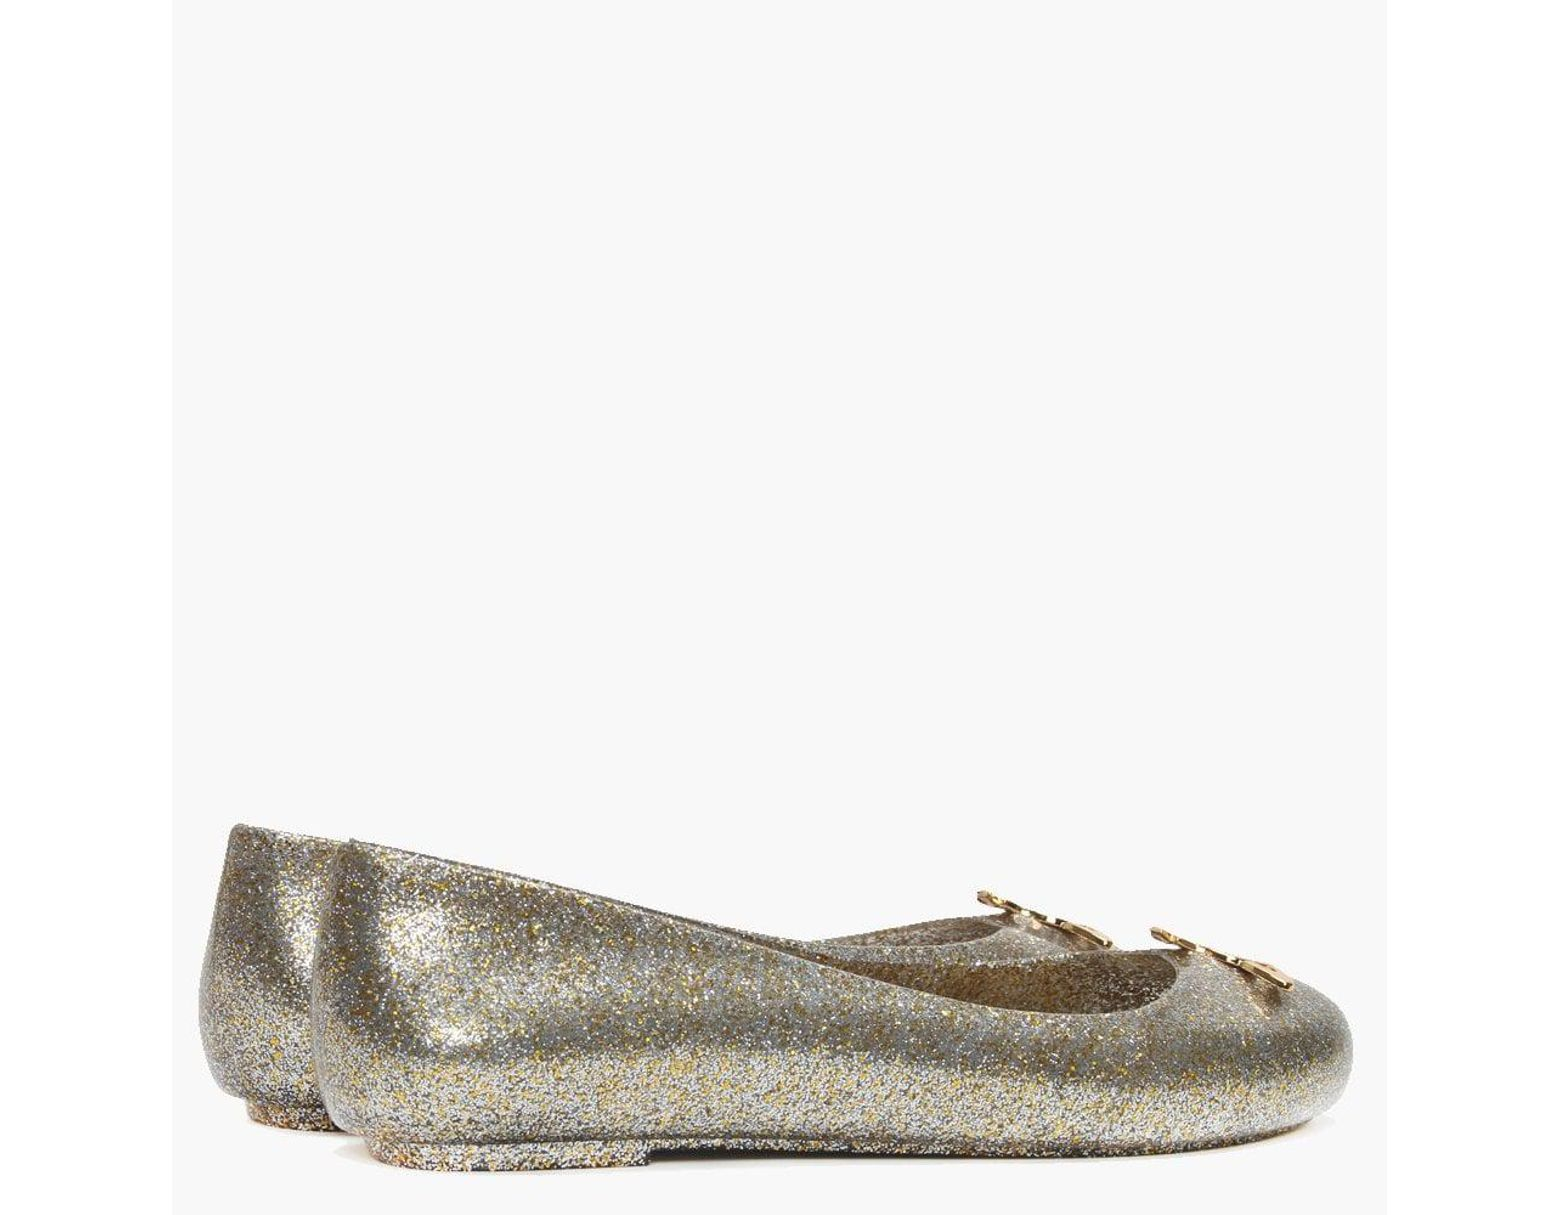 99791c2b2a0 Vivienne Westwood X Melissa Space Love 21 Gold Metallic Glitter Orb Ballet  Pumps in Metallic - Lyst